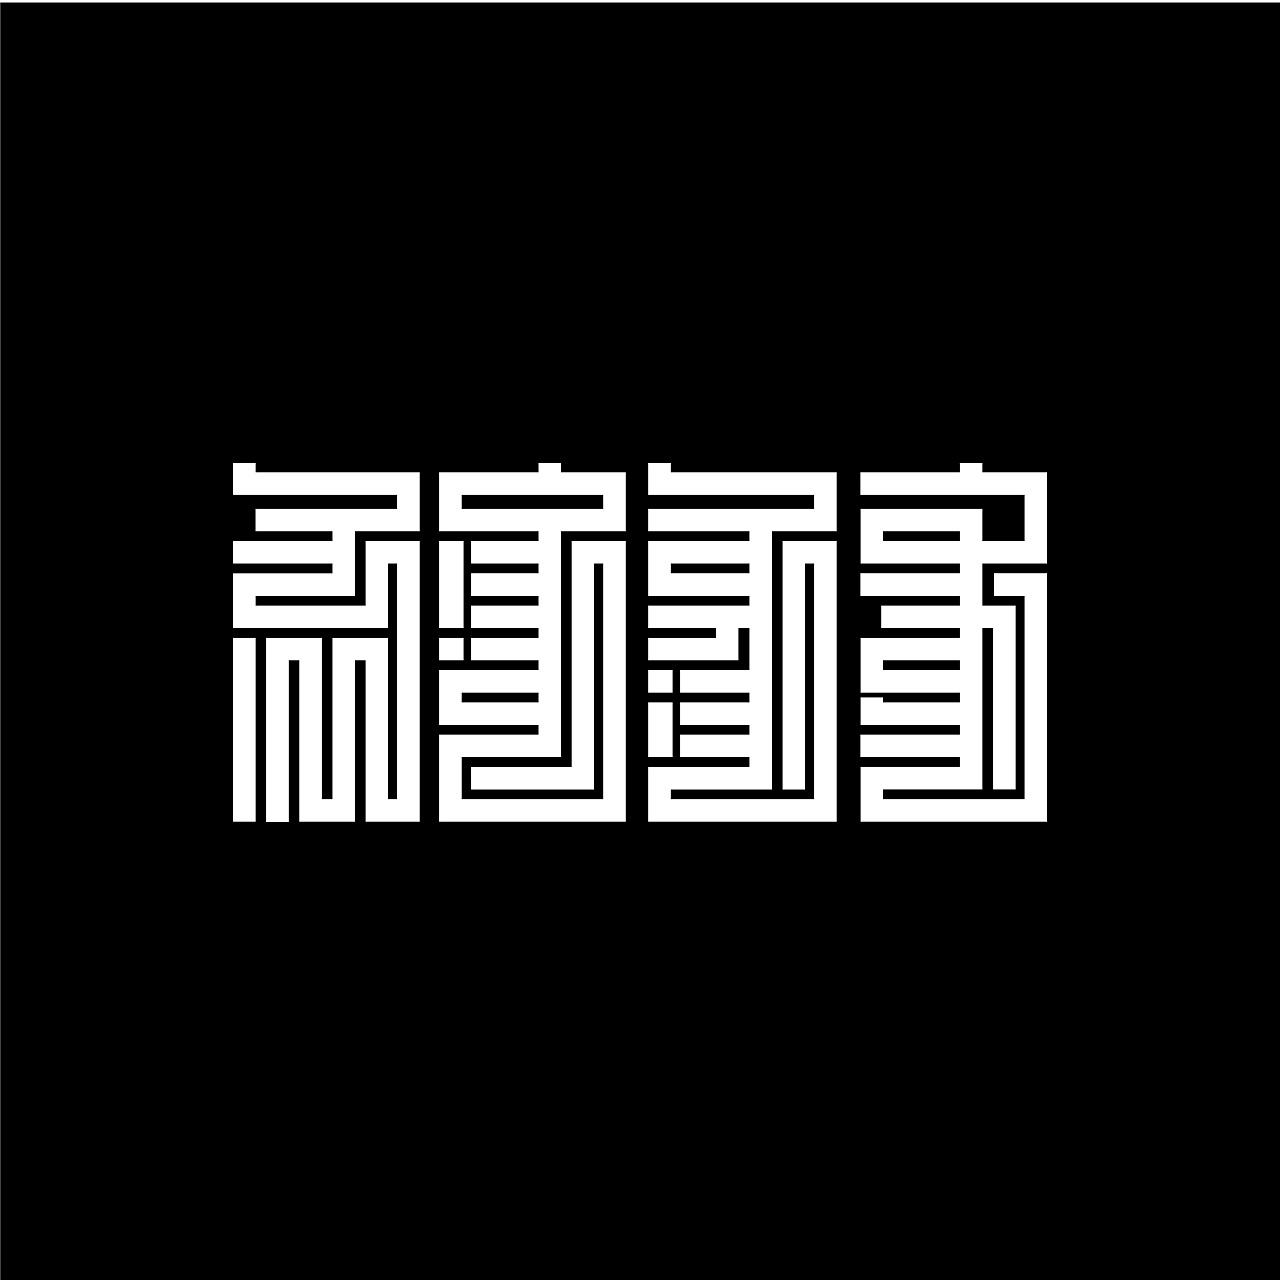 16P Mongolian Font Design Collection